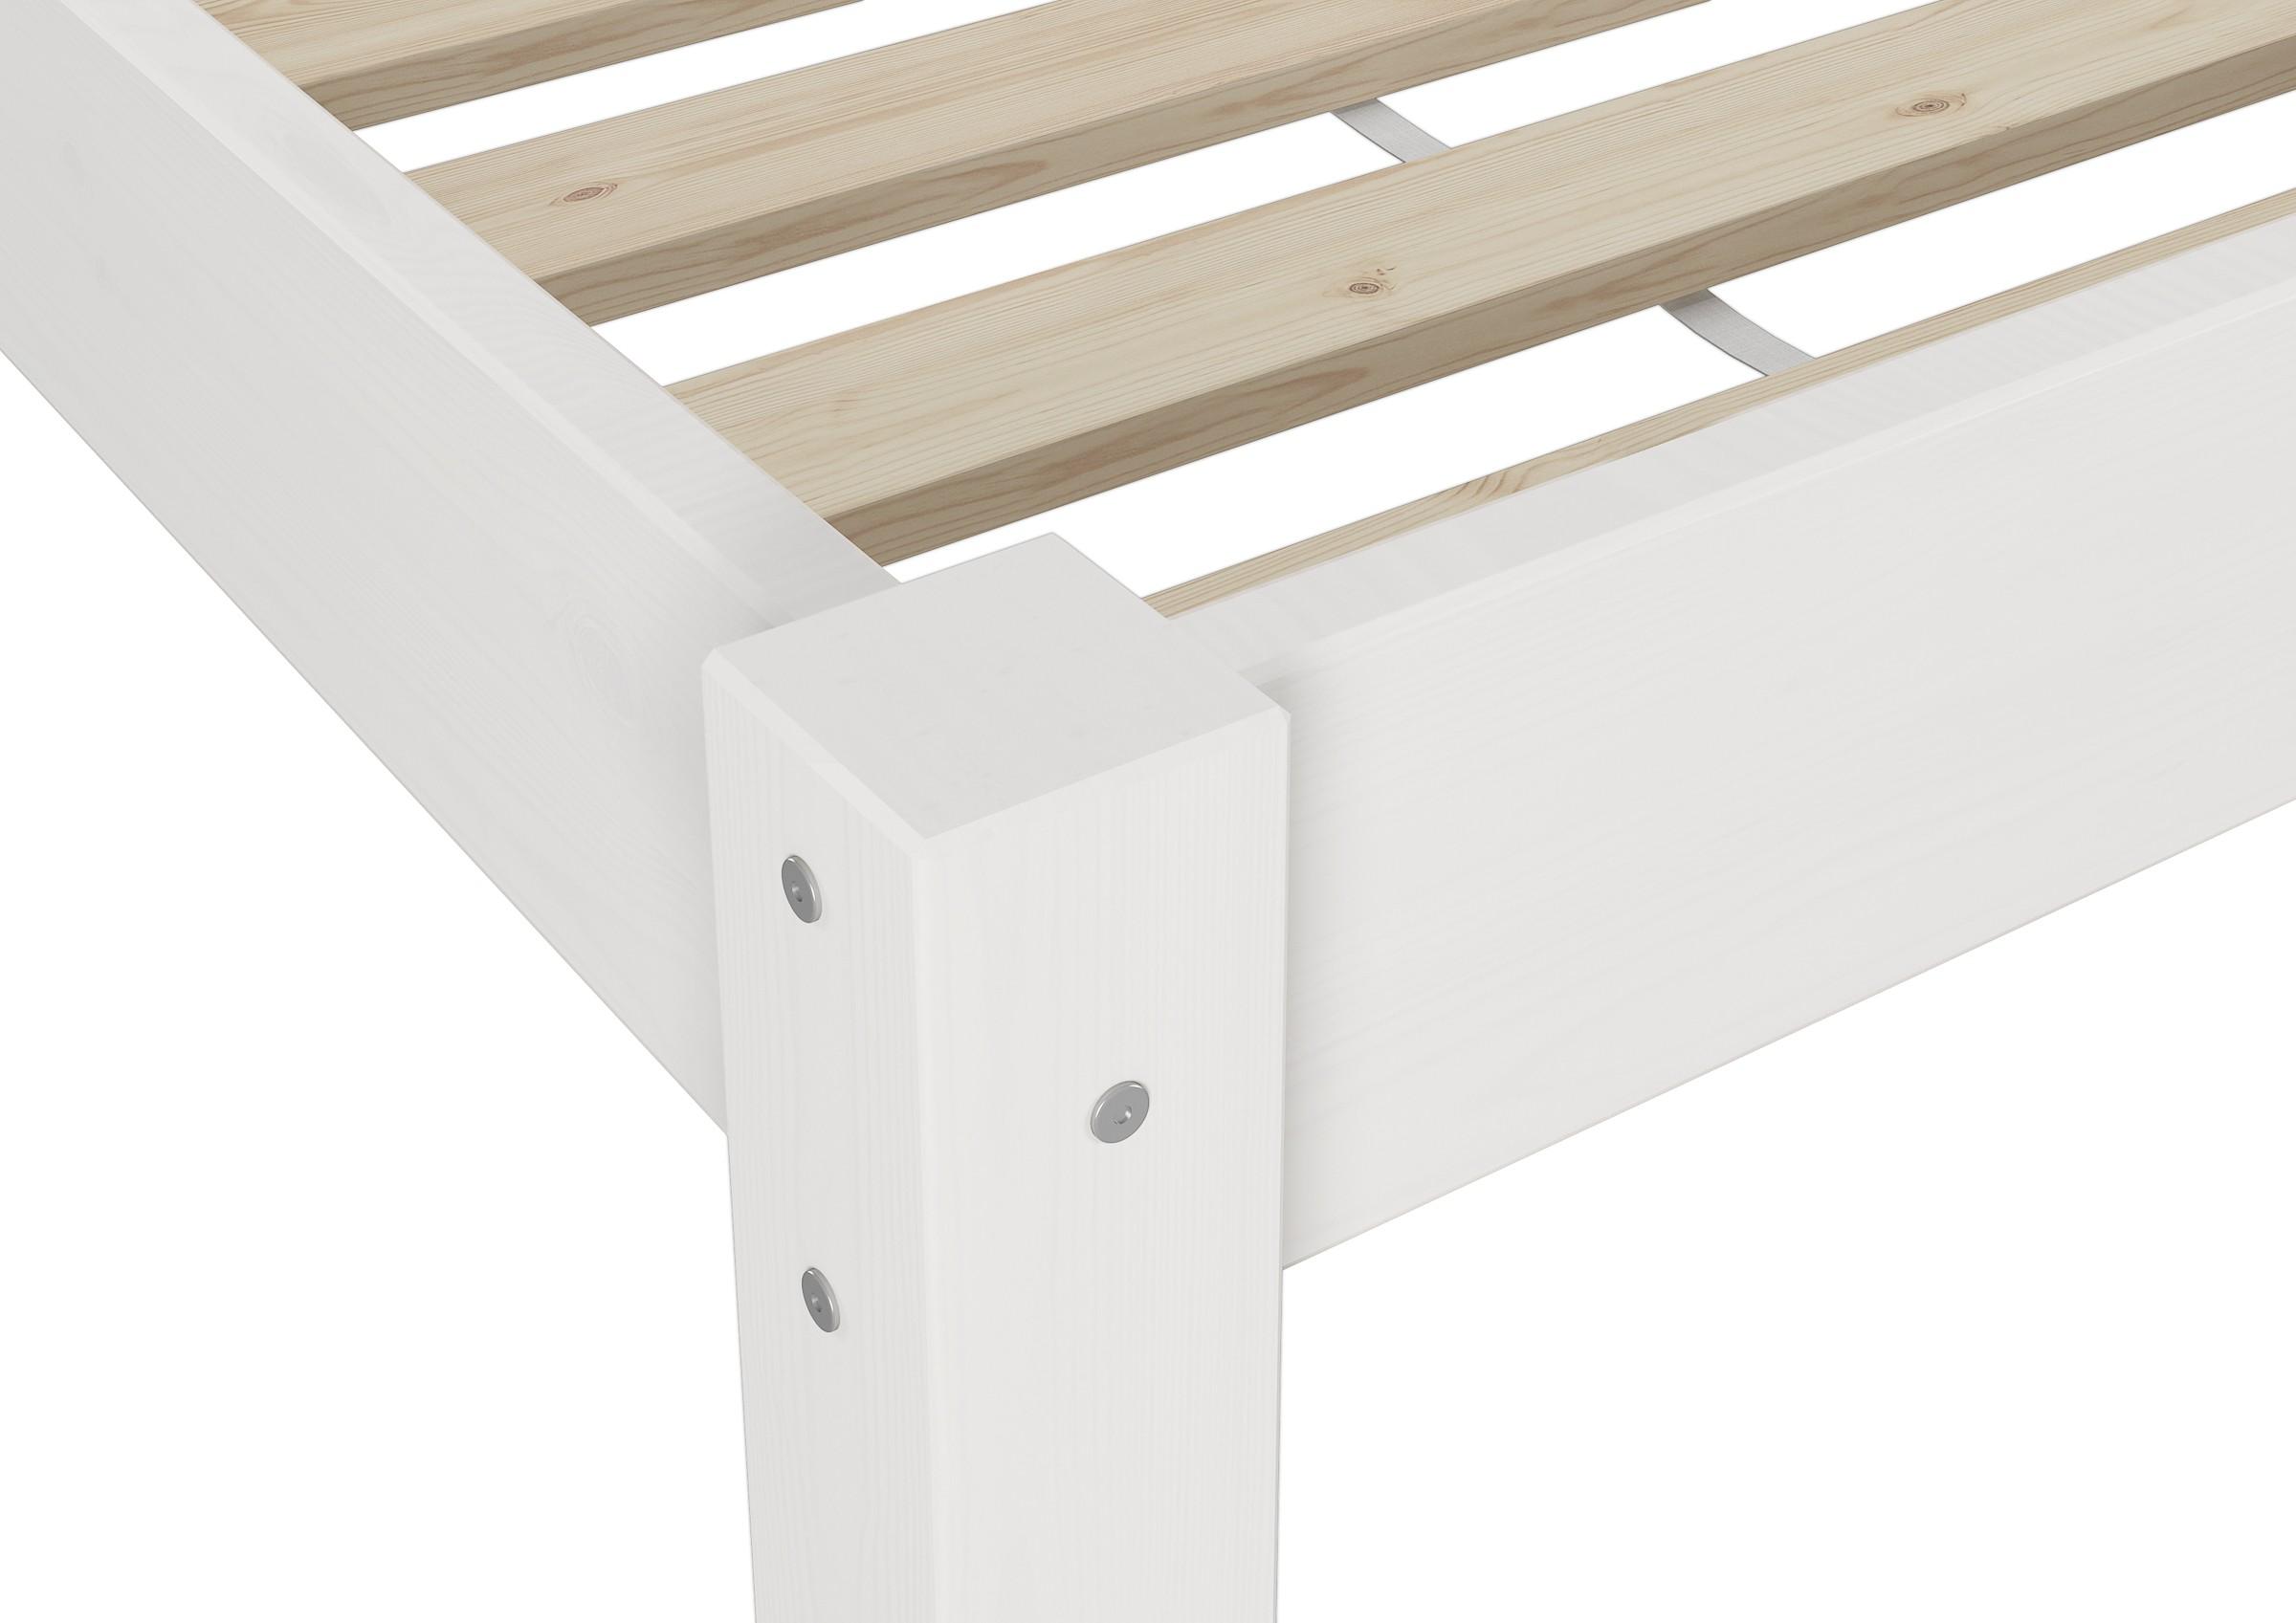 weisses futonbett ohne kopfteil massiv 90x200 bettgestell rollrost w ebay. Black Bedroom Furniture Sets. Home Design Ideas